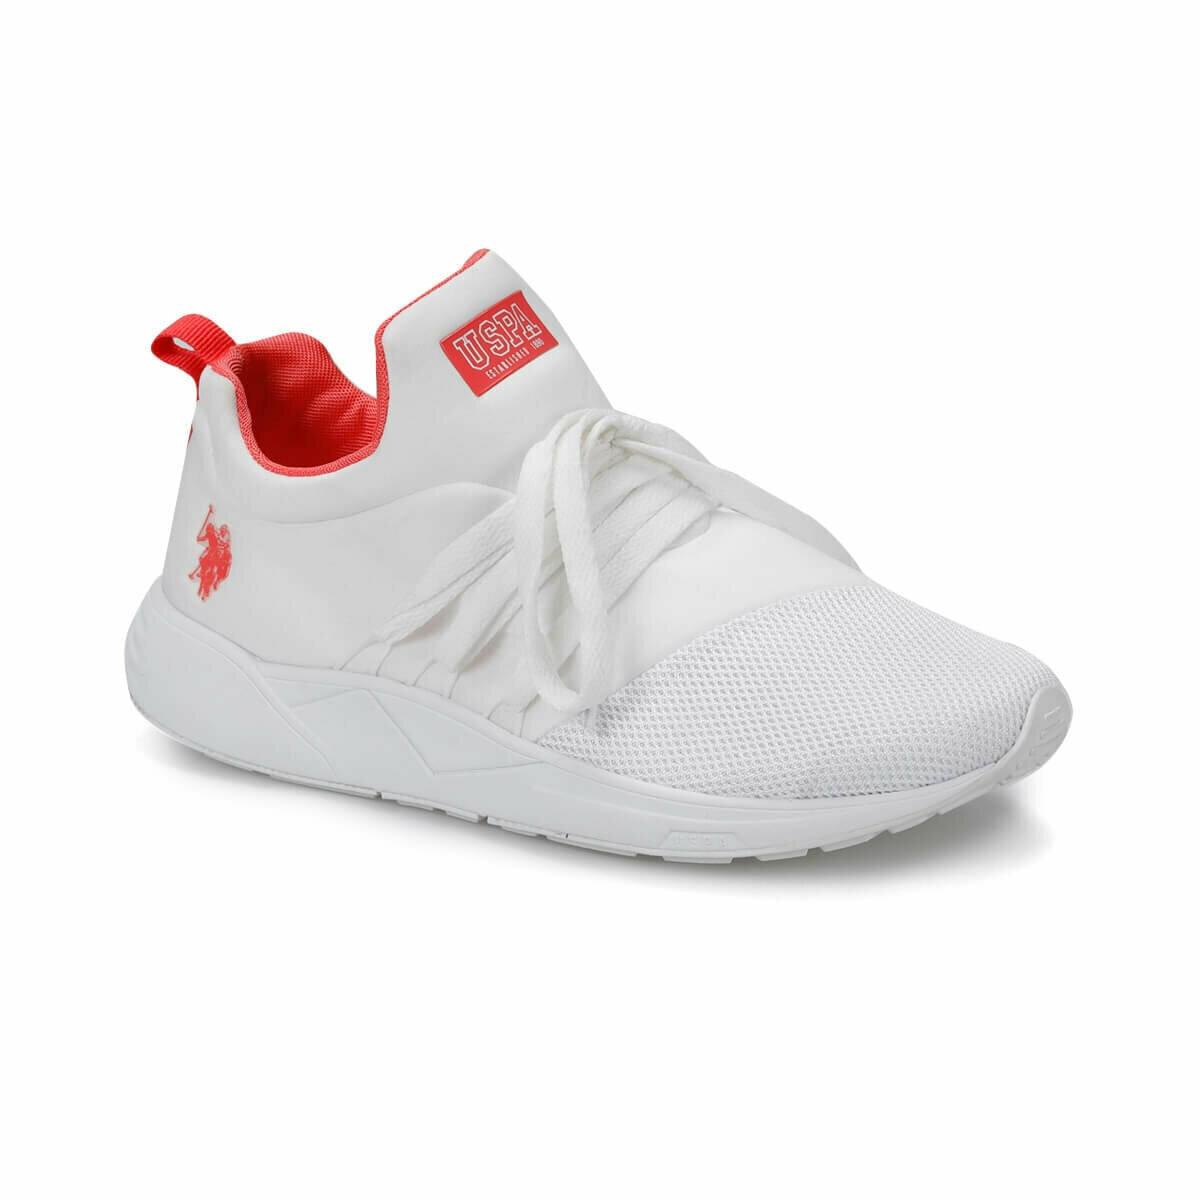 FLO TORK White Women 'S Sneaker Shoes U.S. POLO ASSN.